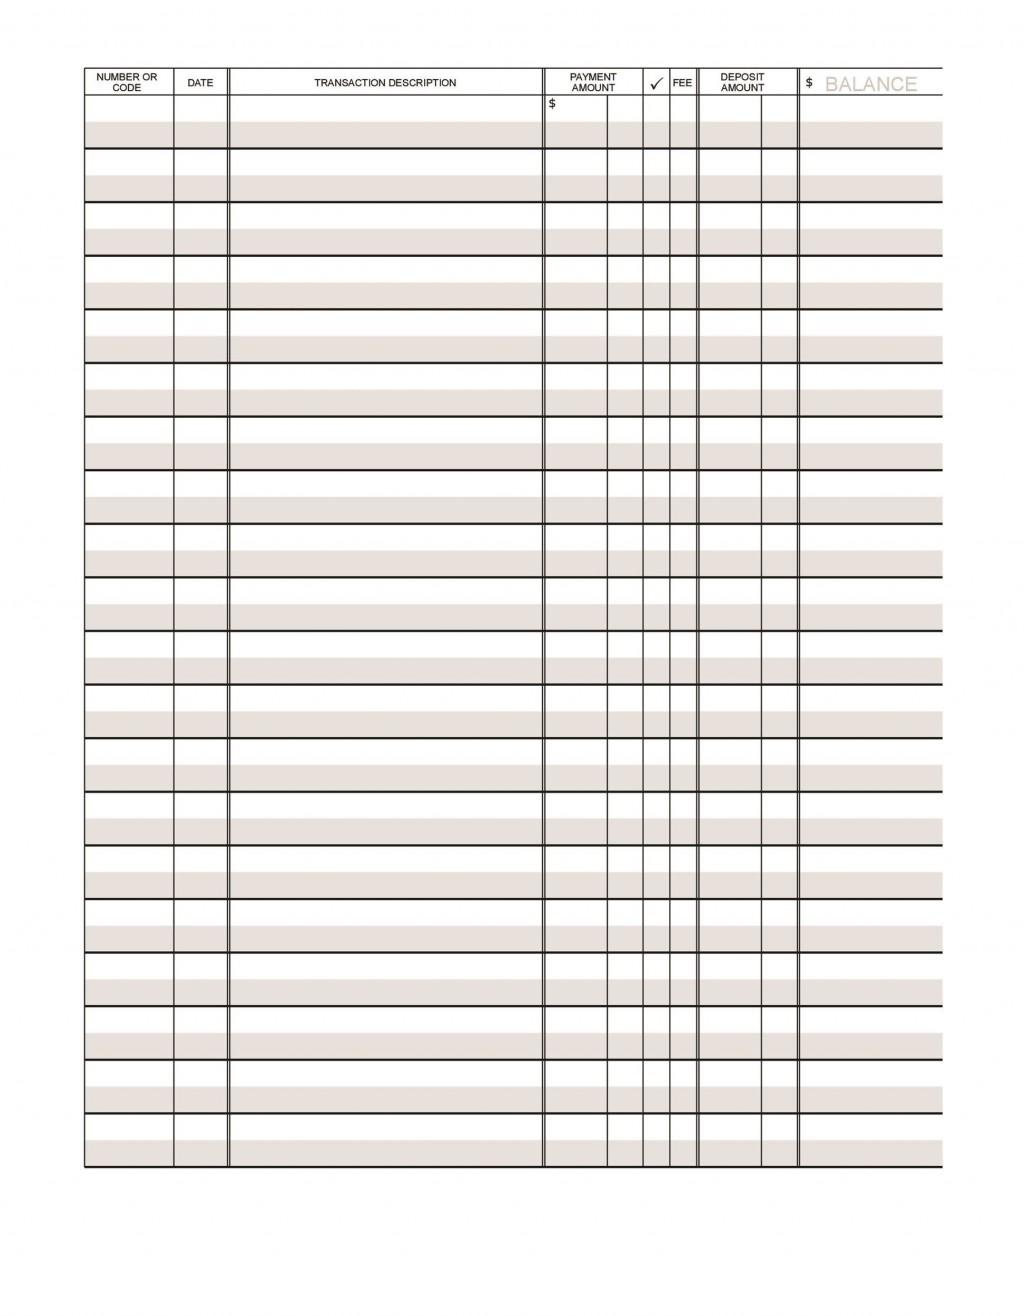 004 Fascinating Checkbook Register Template Excel 2013 Highest Quality Large